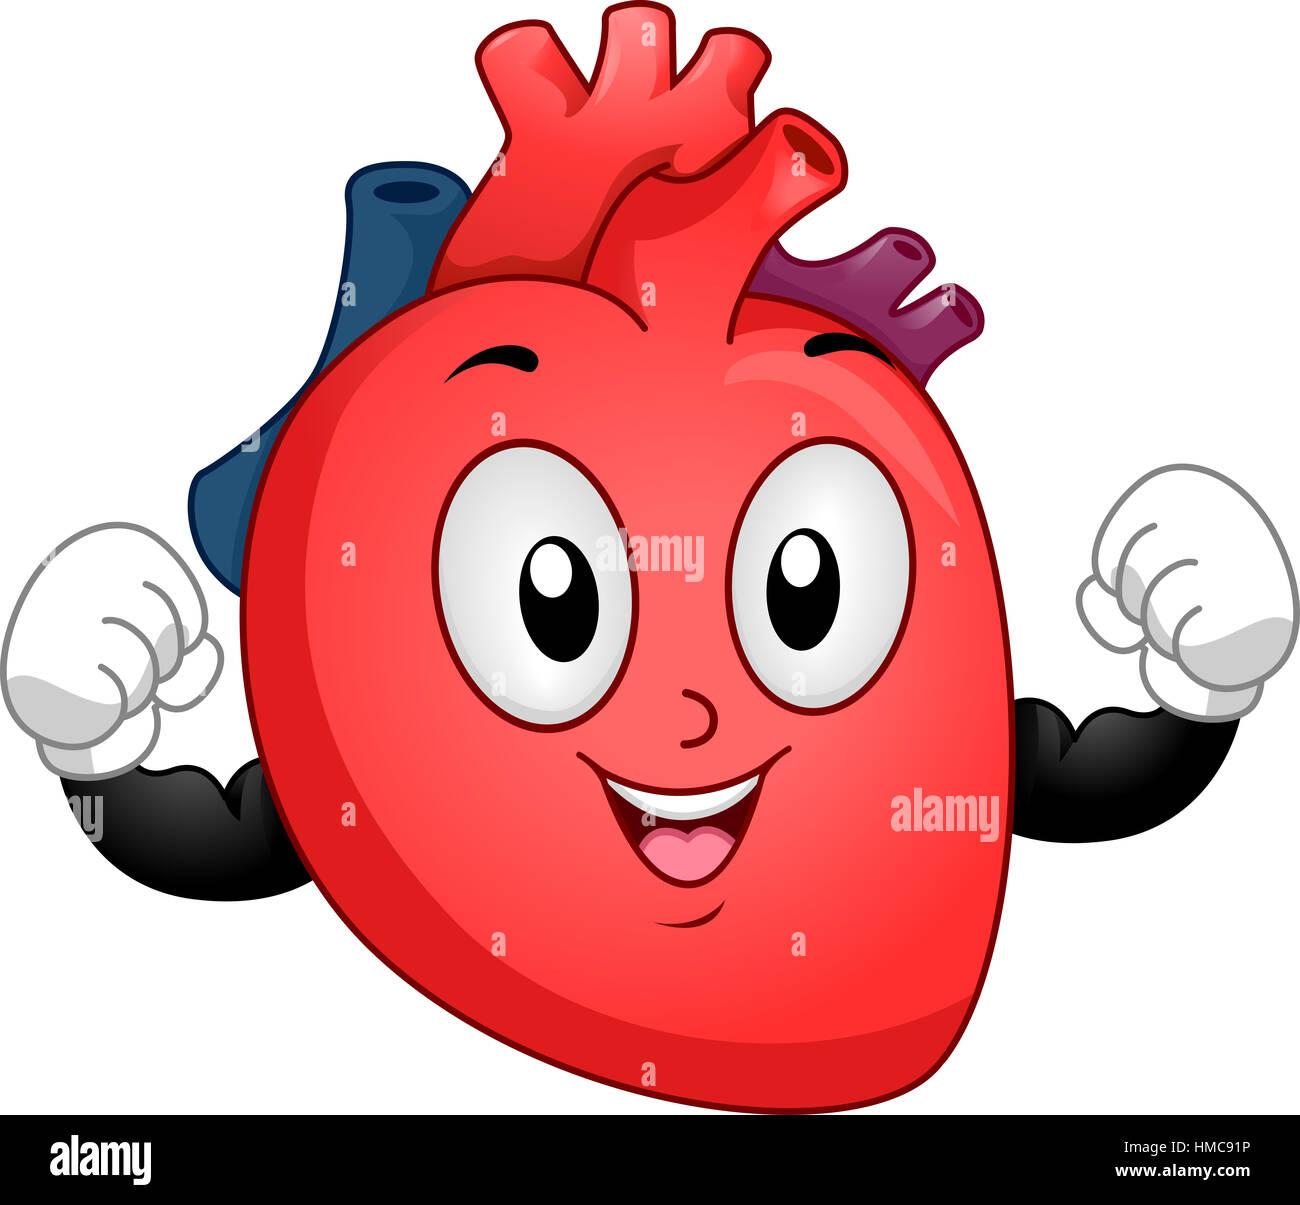 mascot illustration of a healthy human heart flexing its biceps to rh alamy com human heart cartoon diagram human heart cartoon drawing